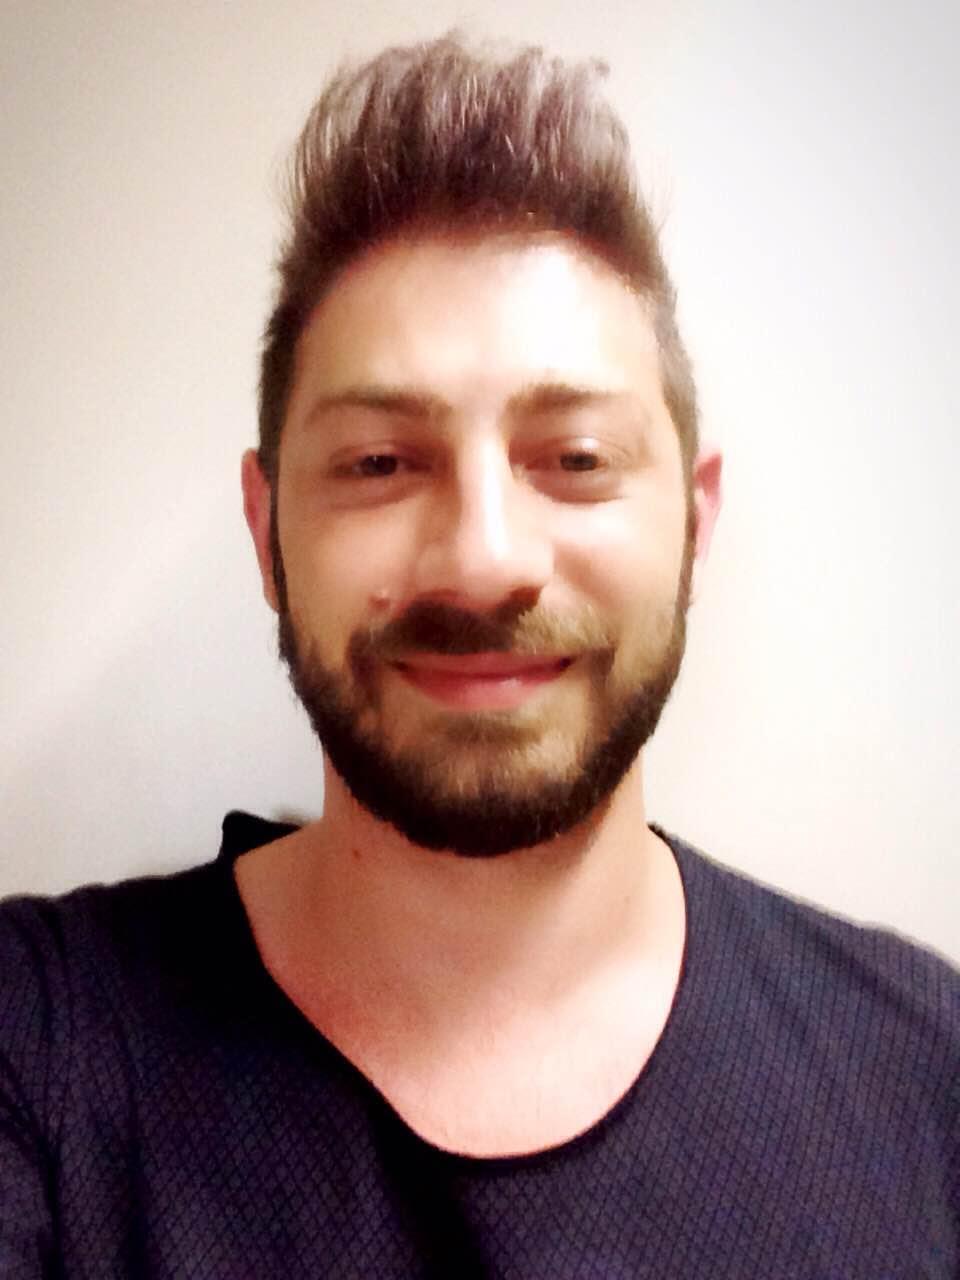 Daniele Pelliccia